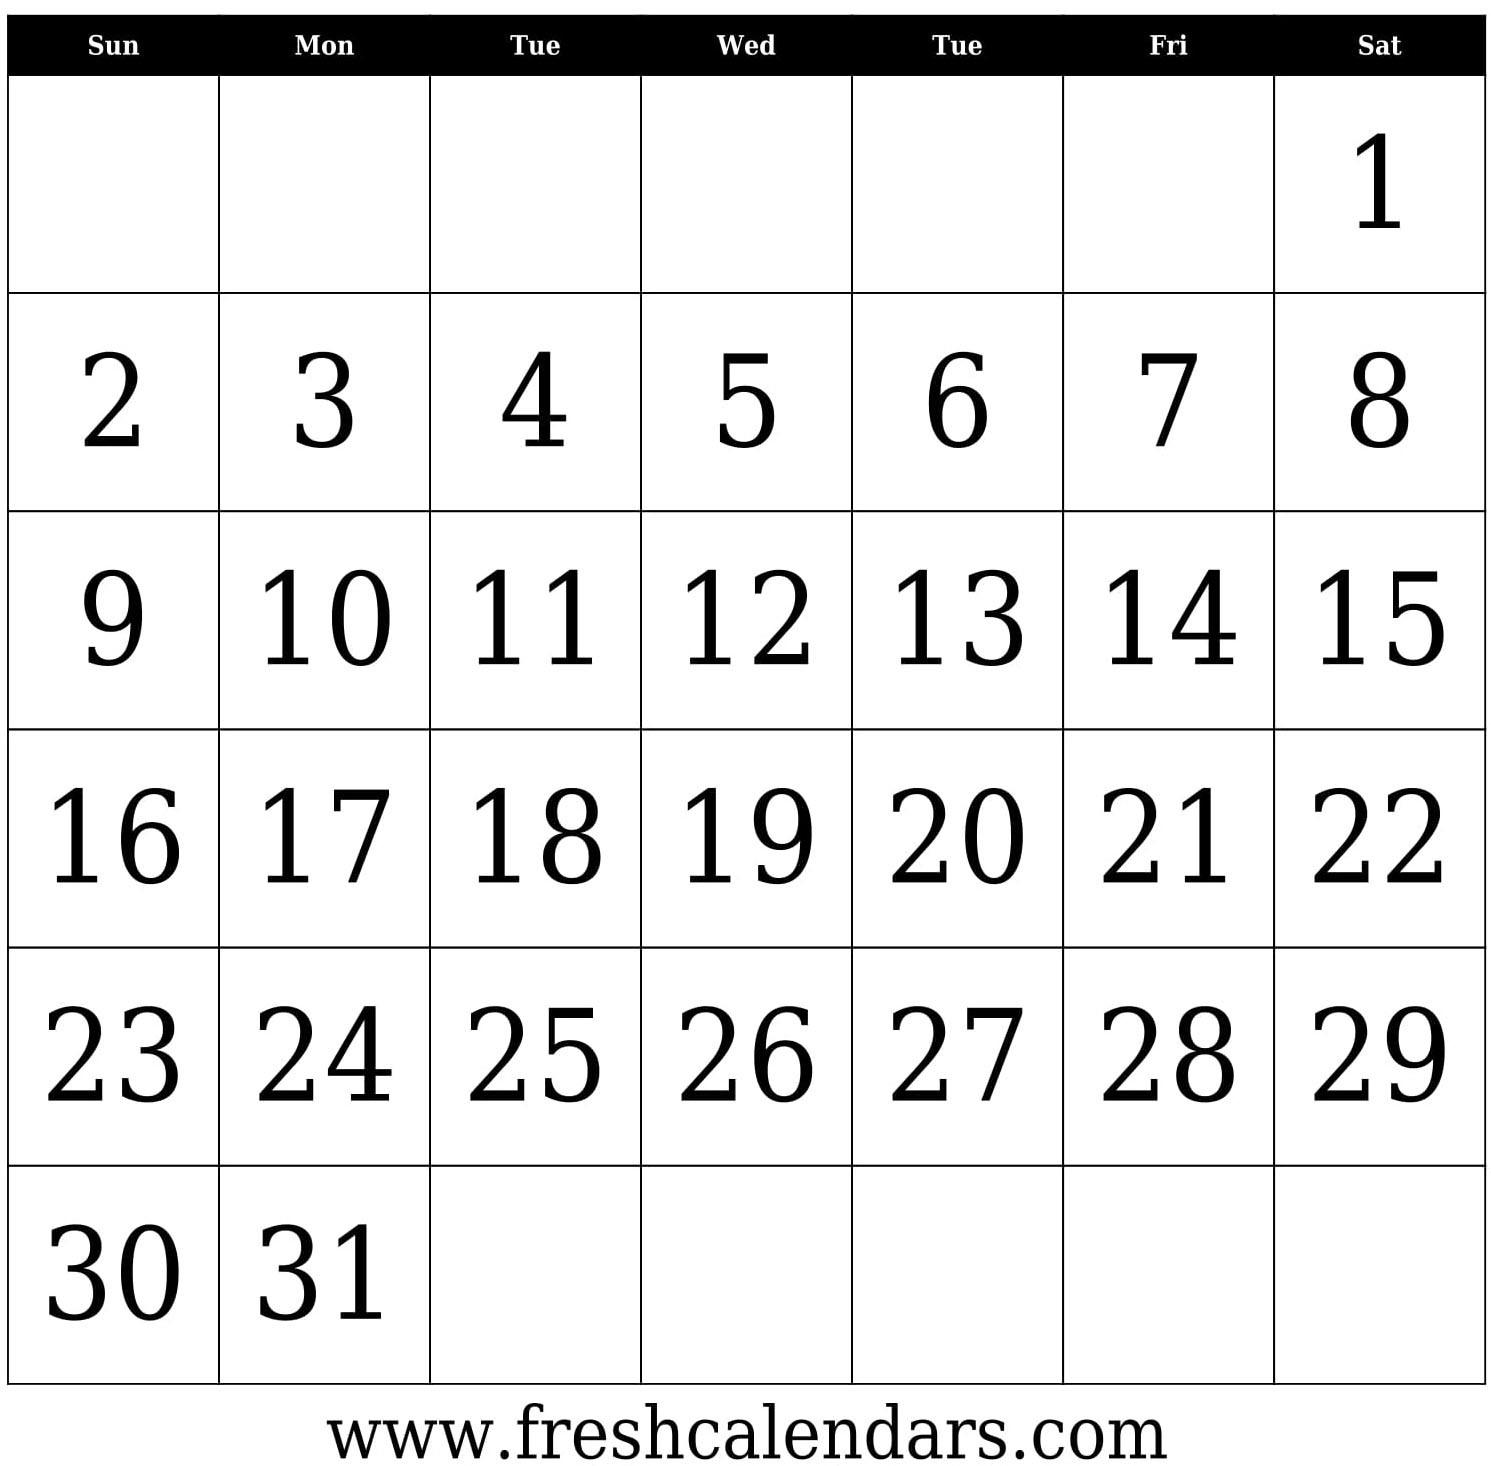 018 Day Calendar Template Blank Wonderfully Printable for Blank 30 Day Challenge Calendar